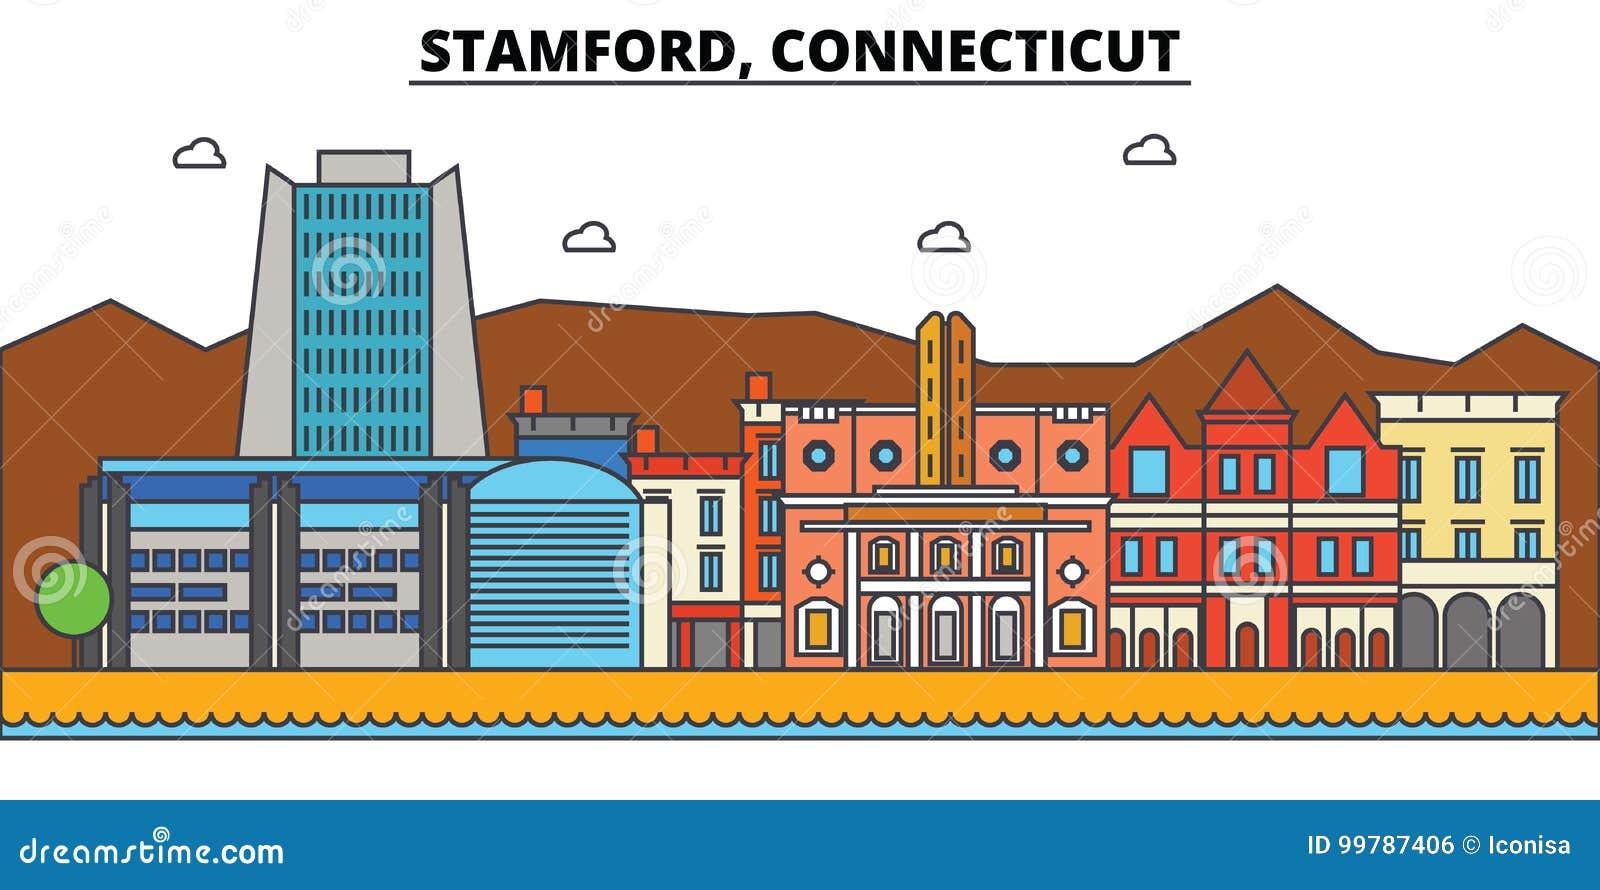 Stamford, Connecticut De architectuur van de stadshorizon